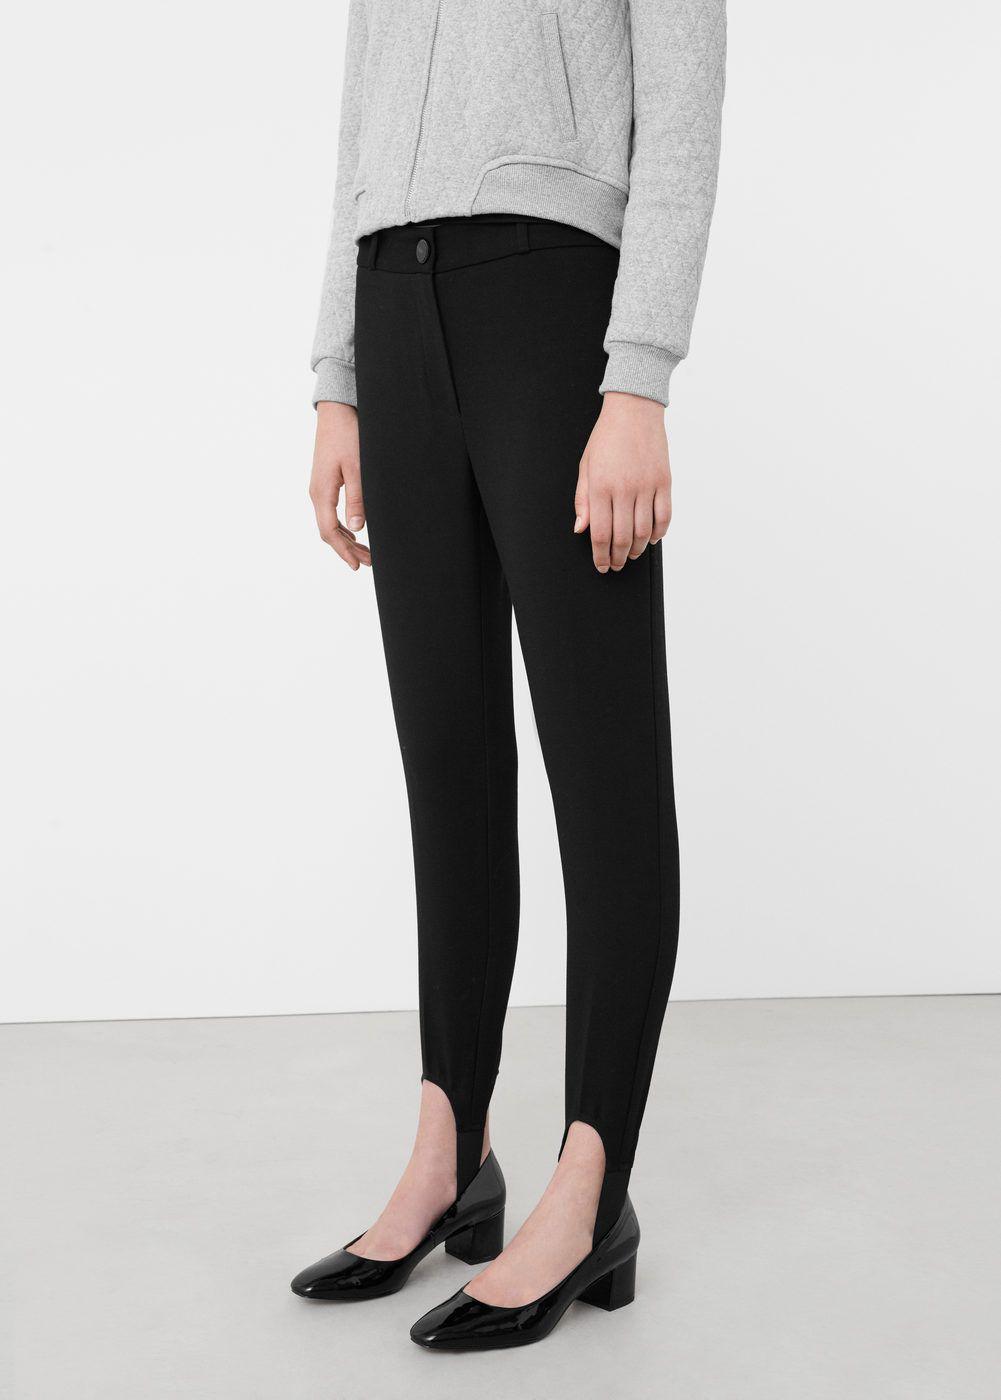 pantalon fuseau femme zara